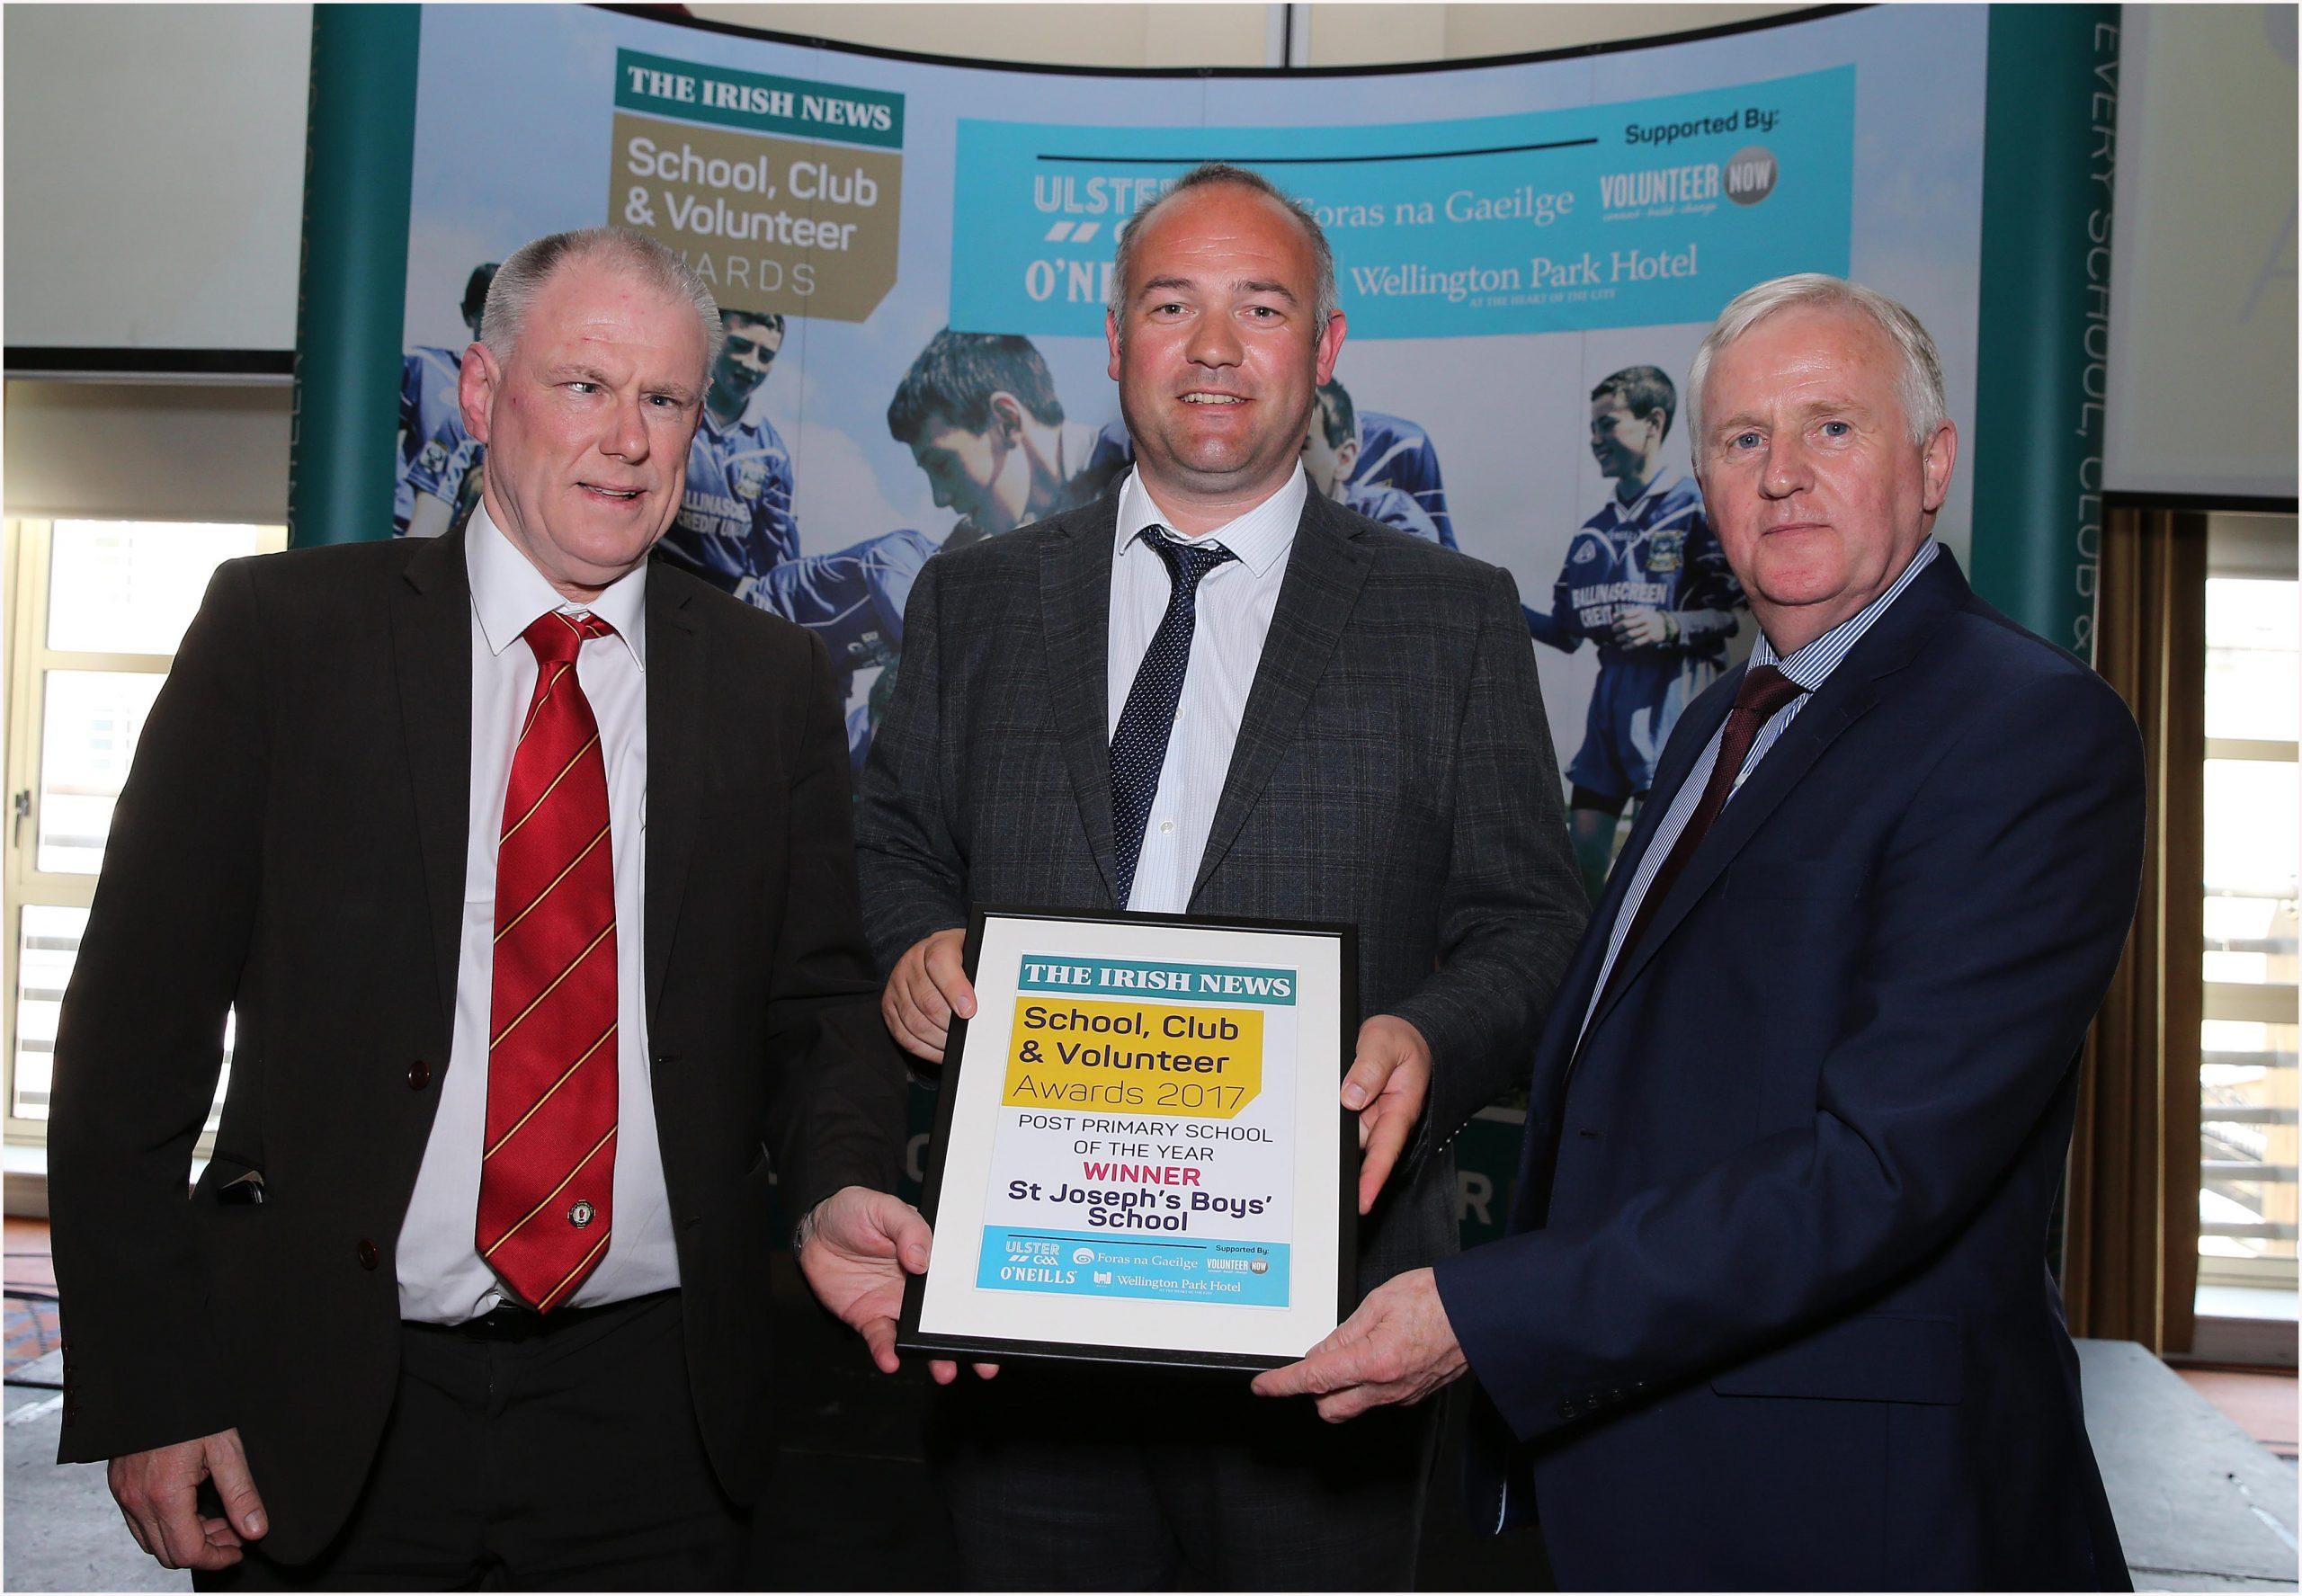 The Irish News Club & Volunteer Awards Winners 2017